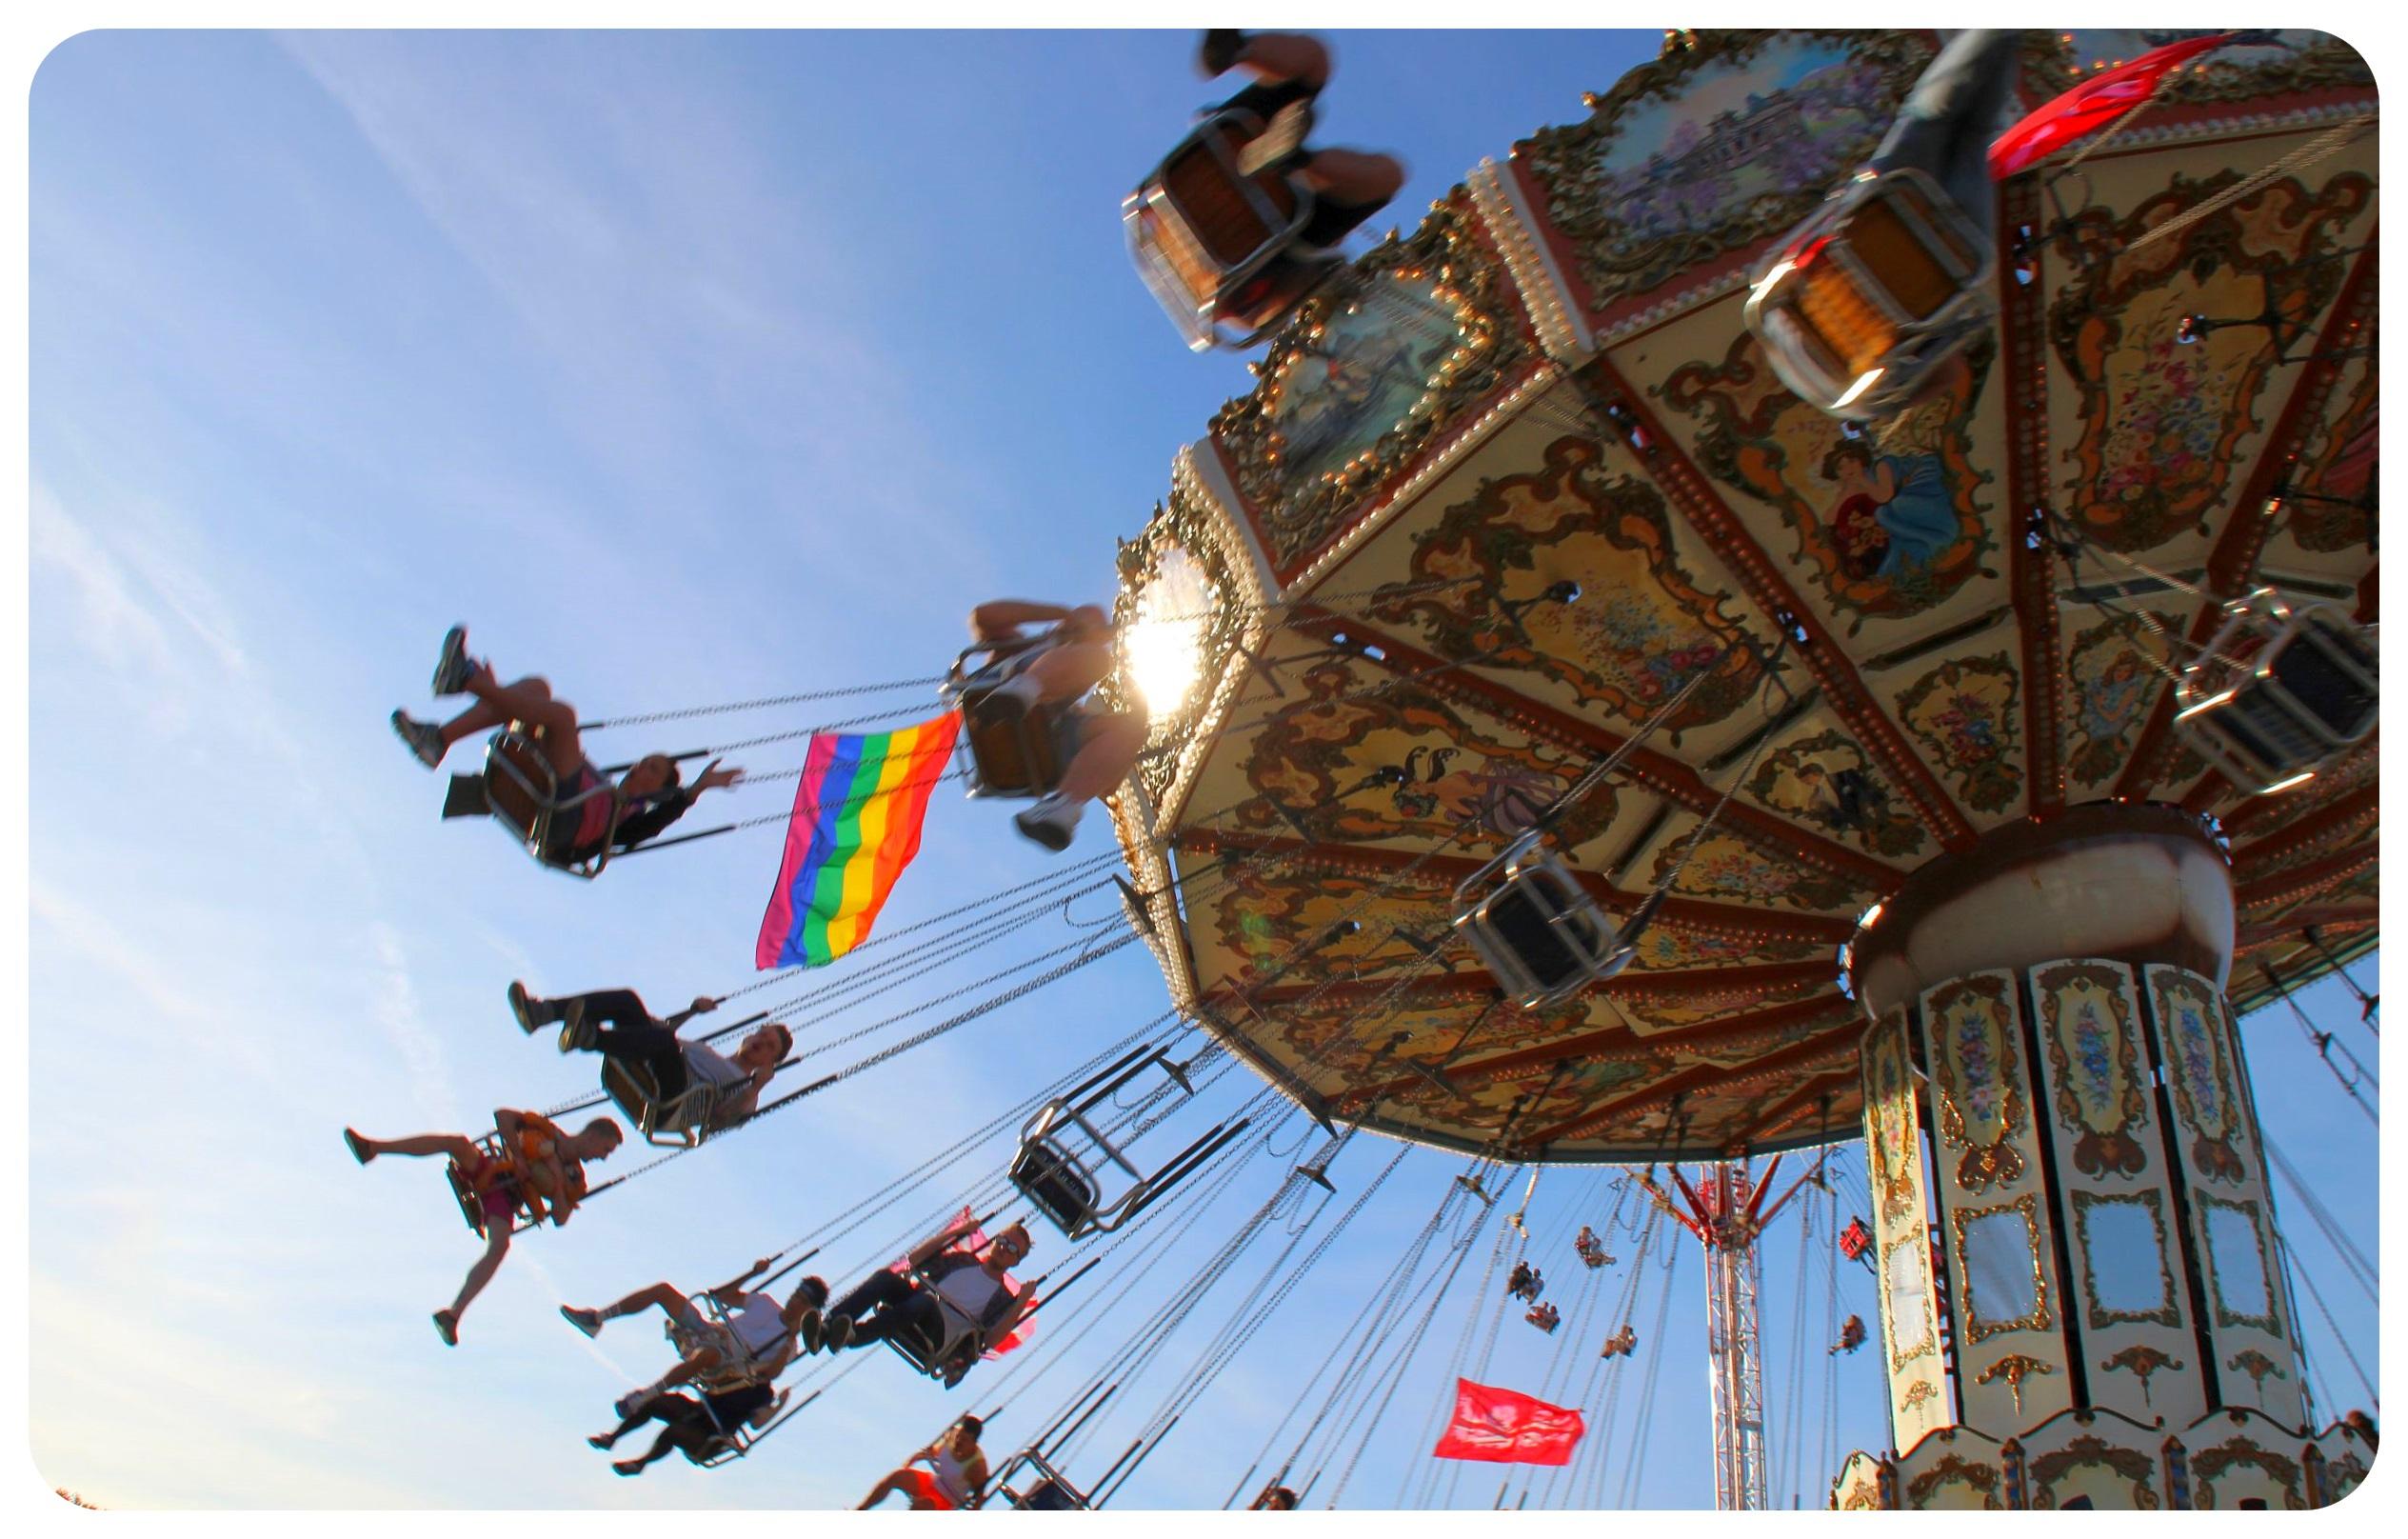 Brighton Pride festival grounds carousel 2015